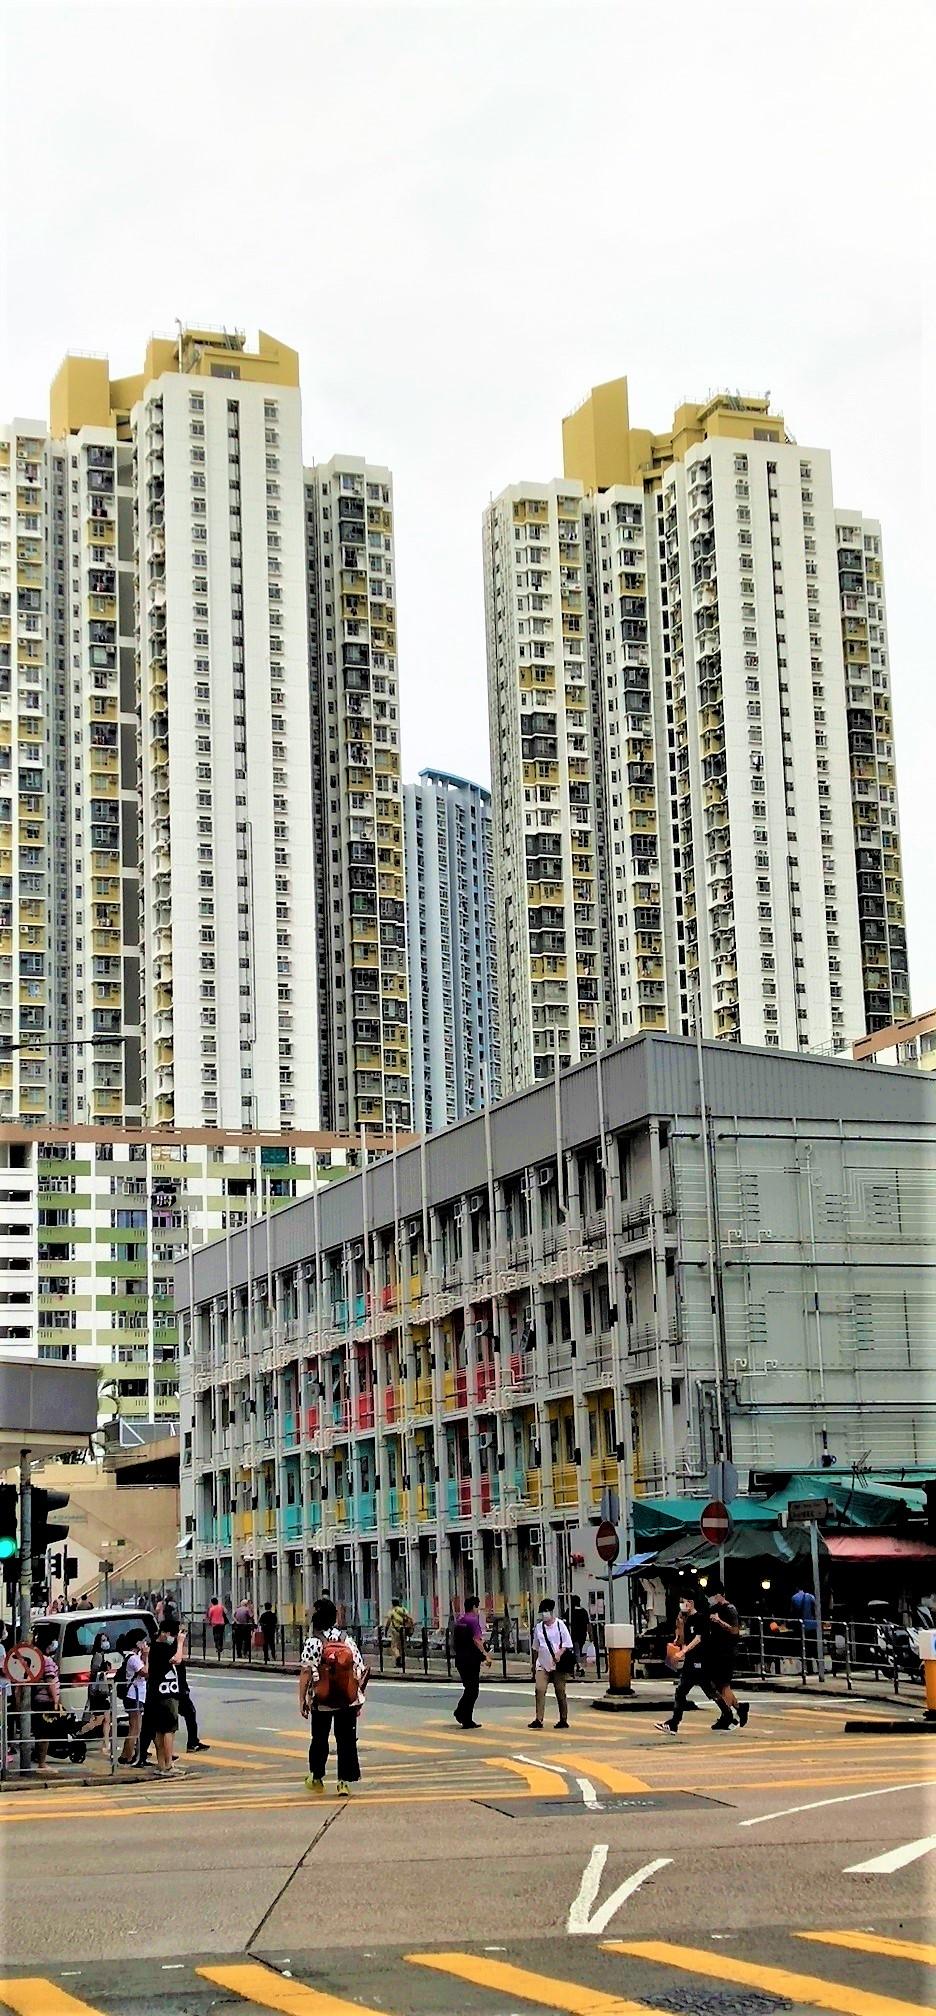 Transtional housing is near the public housing estate.